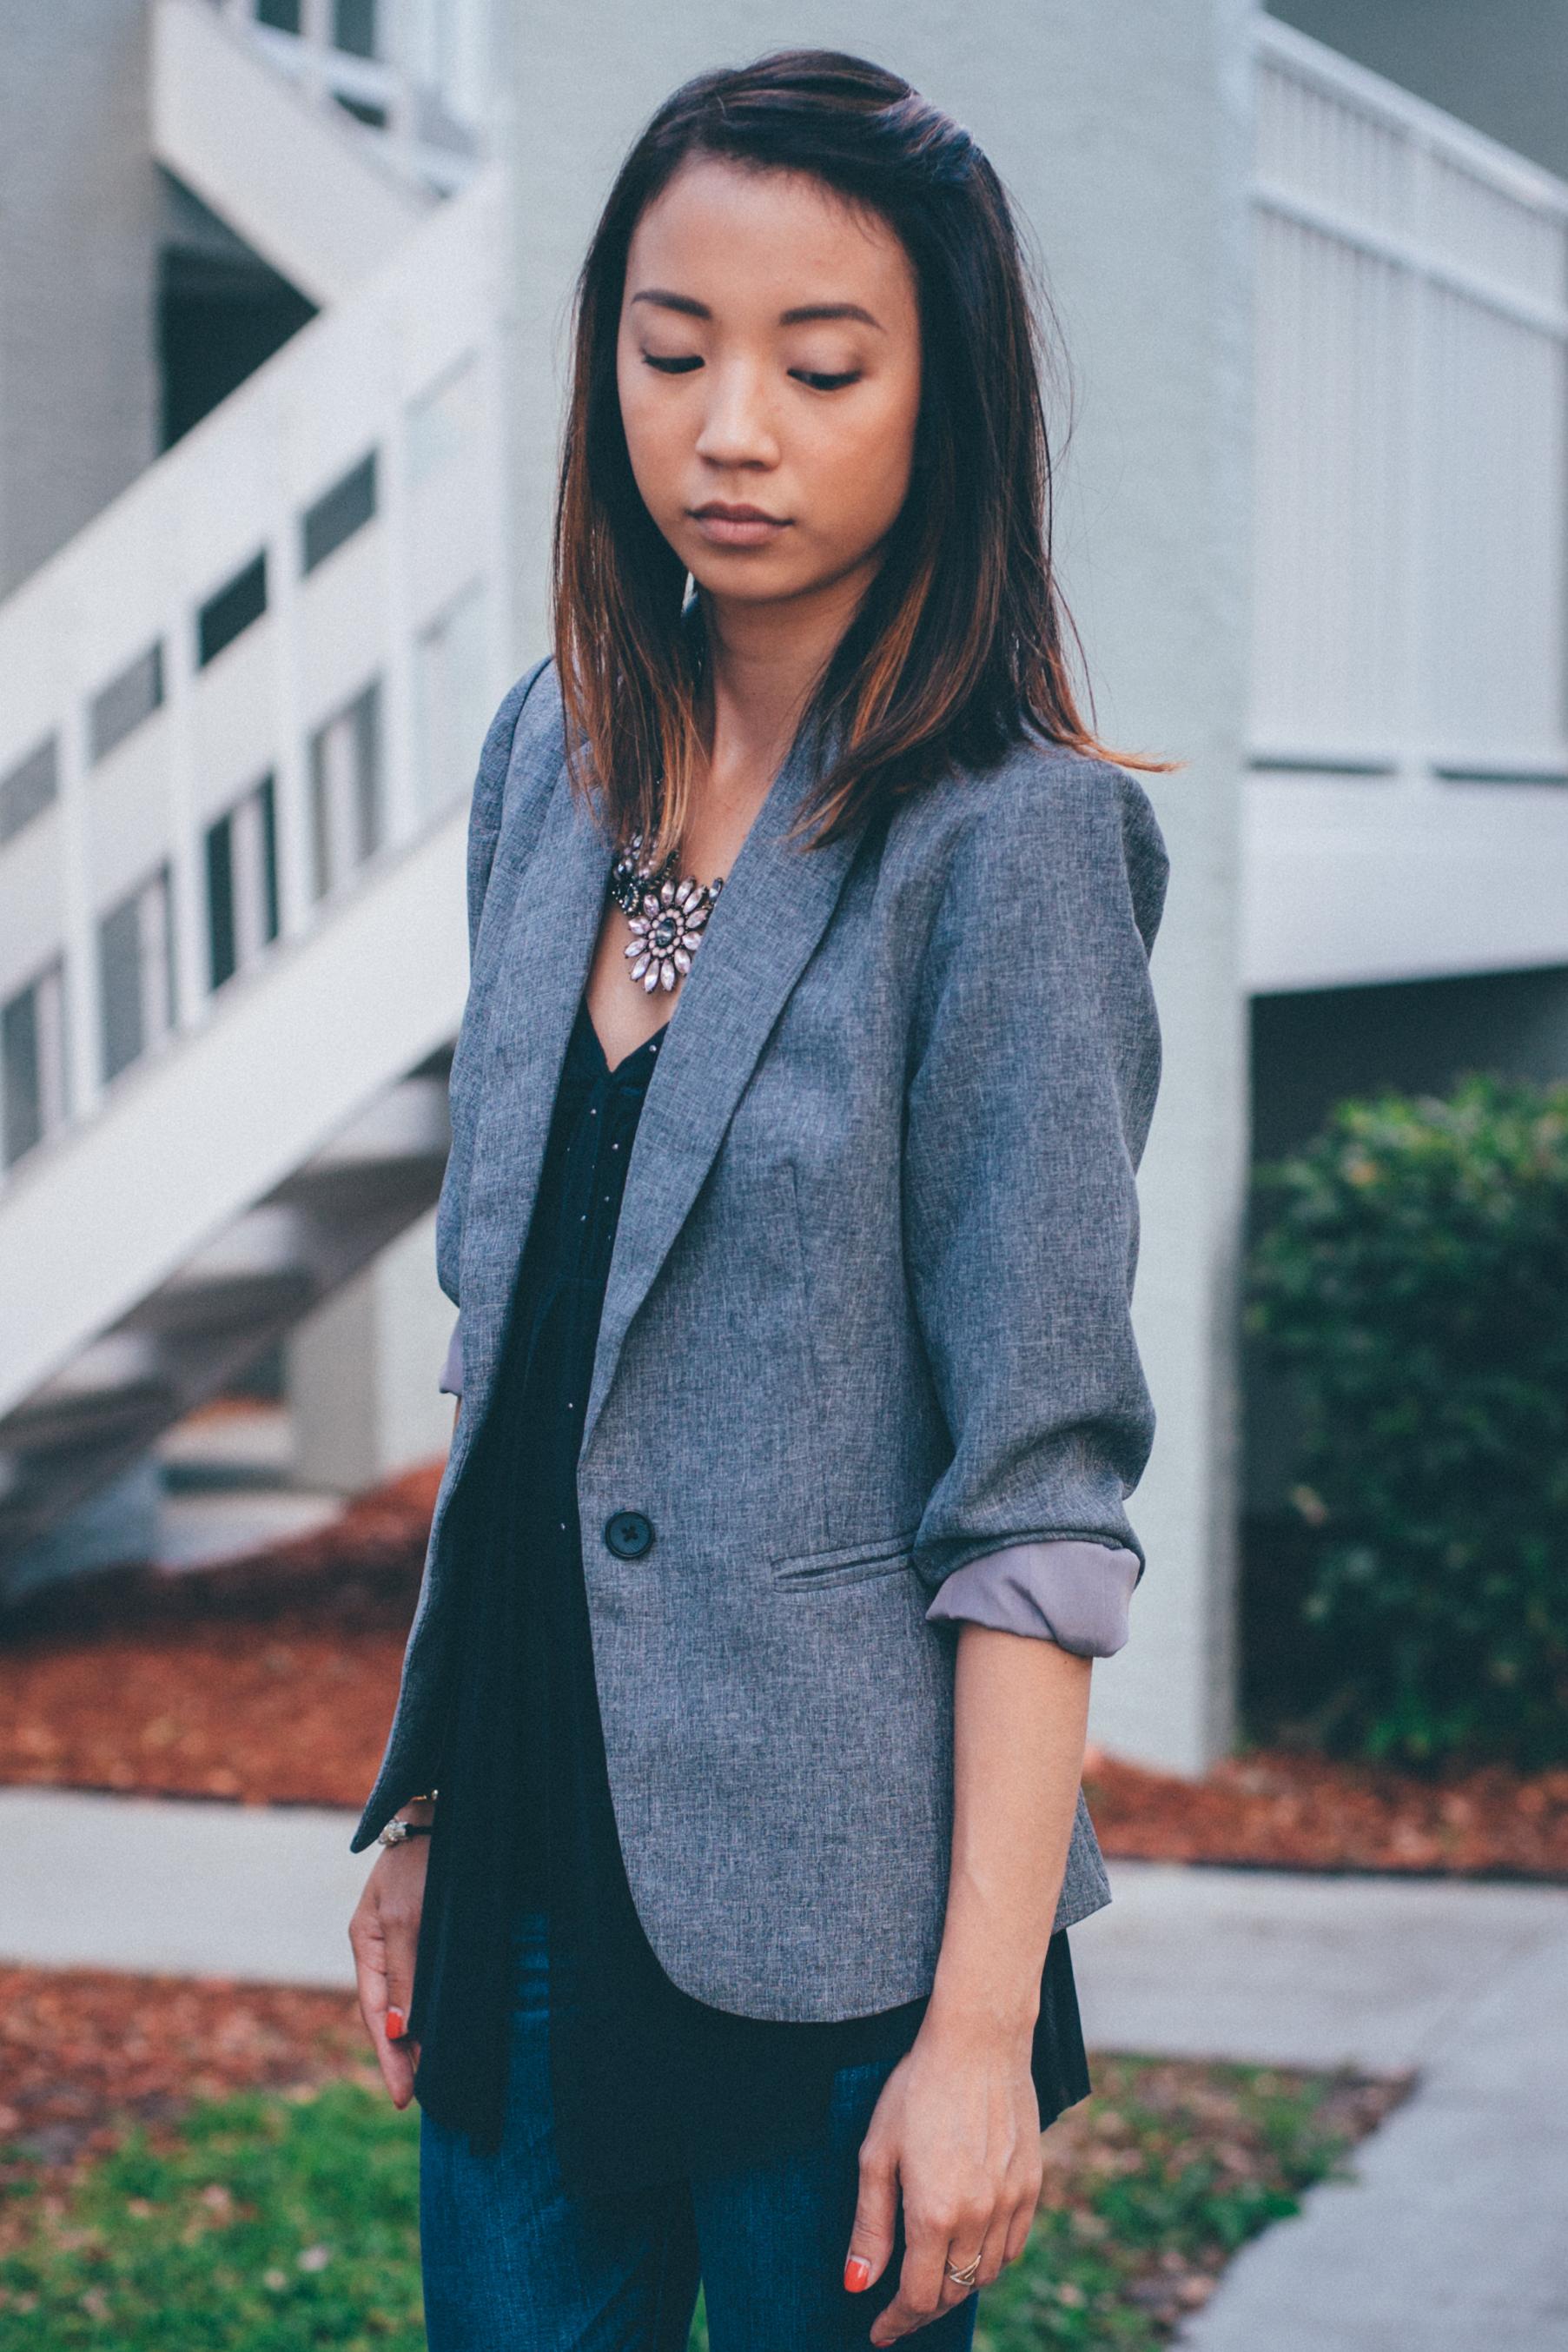 This Jenn Girl - Shein Gray Blazer 2